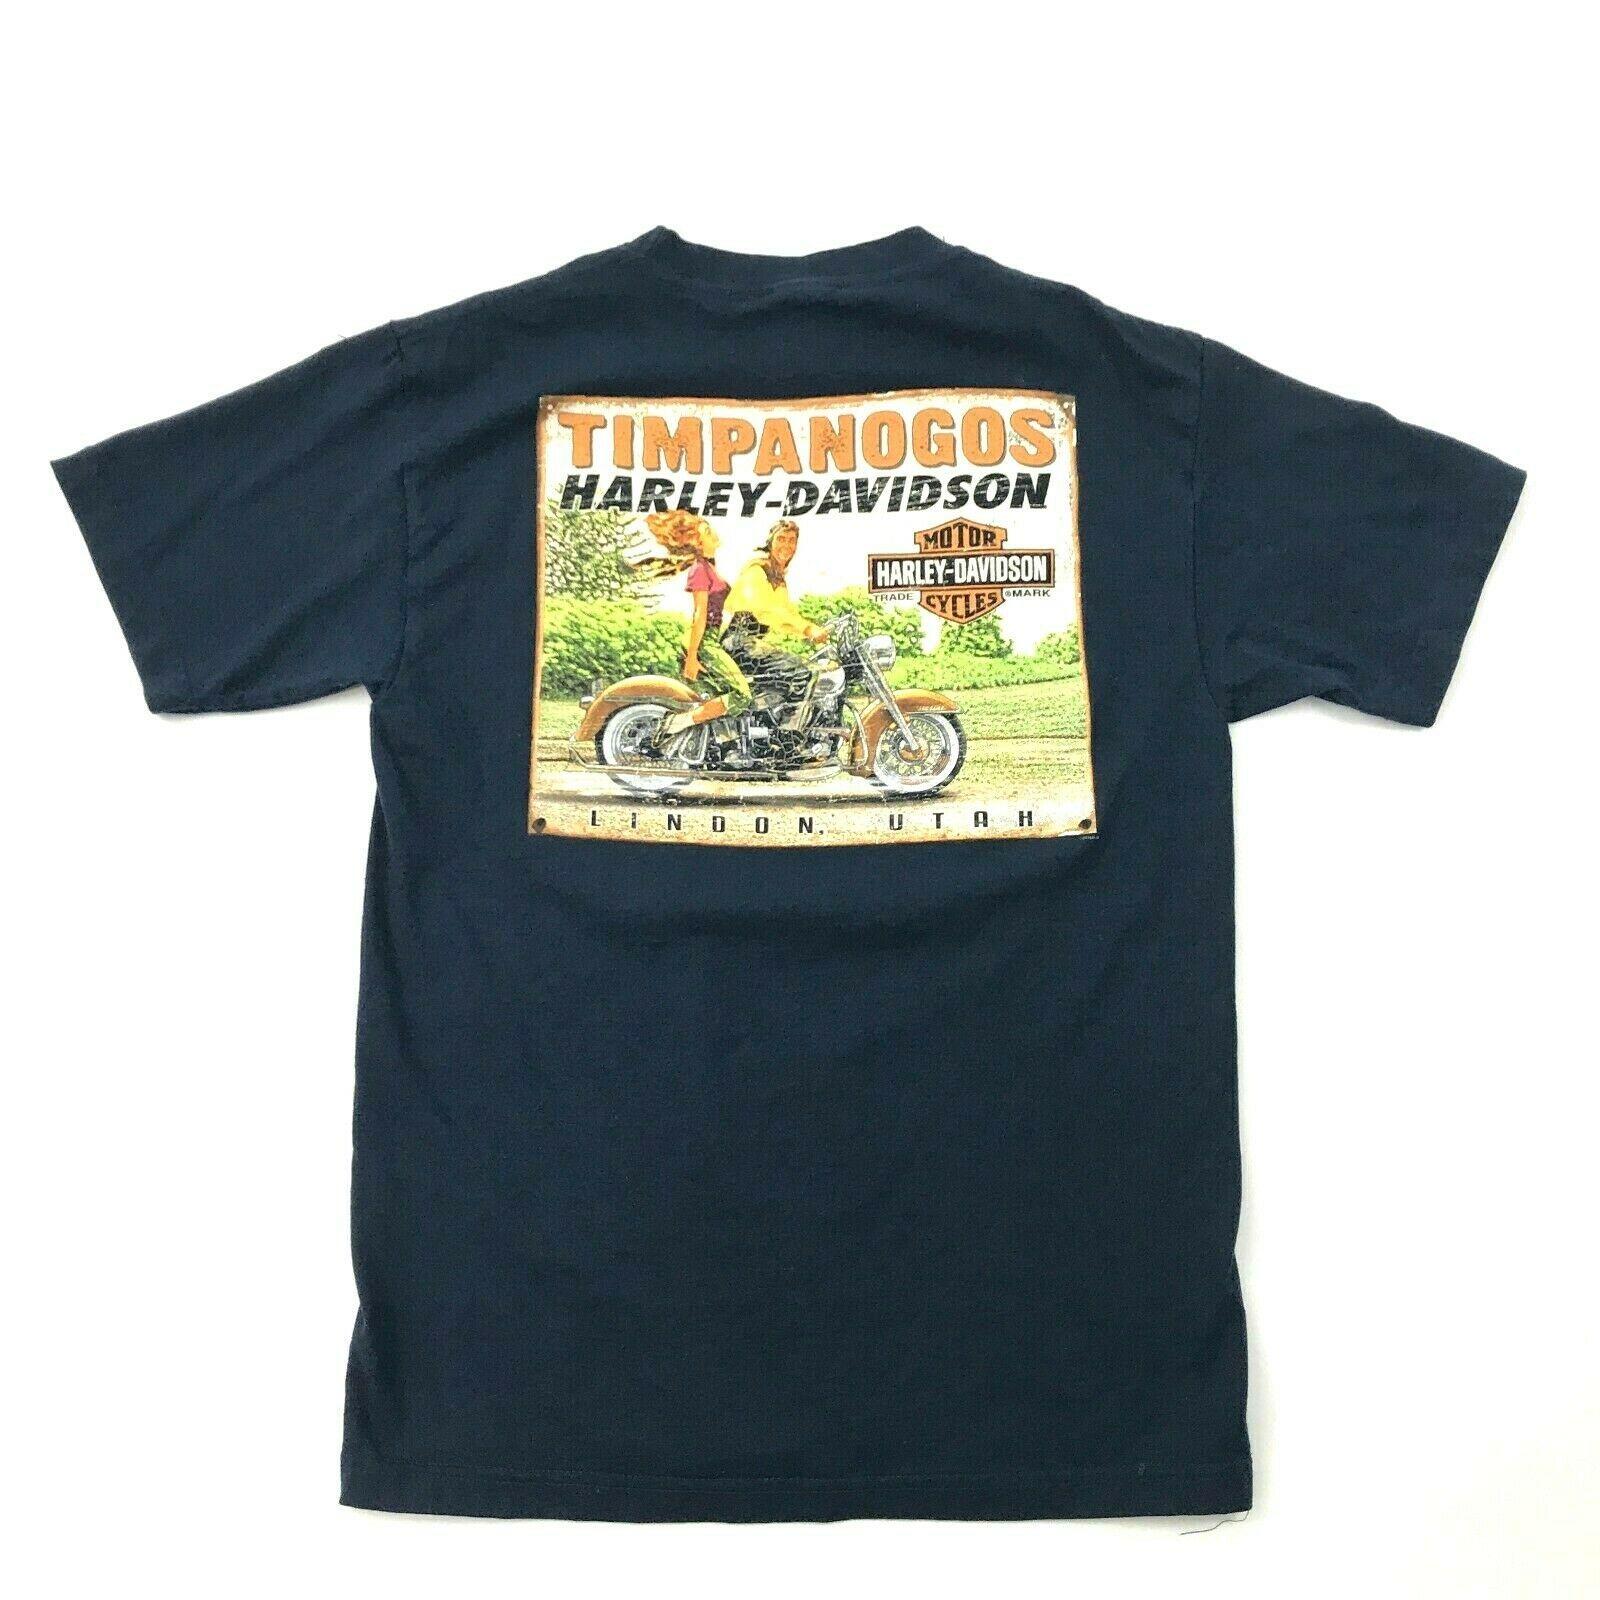 Harley Davidson Imagen Retro Camisa Dos Caras Azul Marino Motero Camiseta TALLA image 2